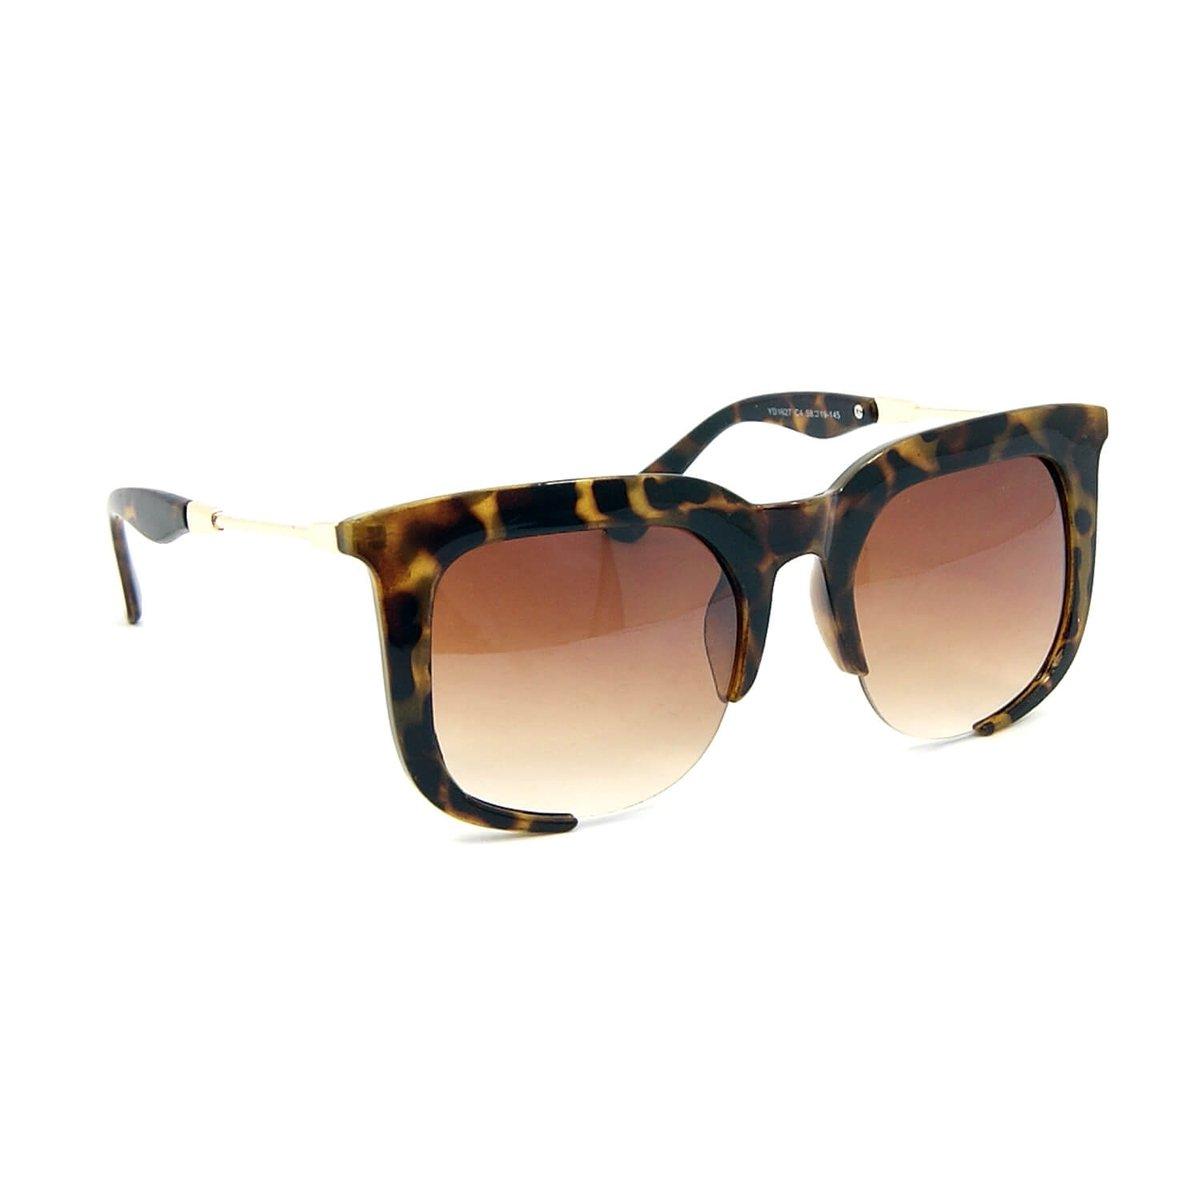 93ad4a60ee3fd Óculos Bijoulux de Sol Oncinha Estilo Rasoir Sum da Miu Miu - Compre Agora